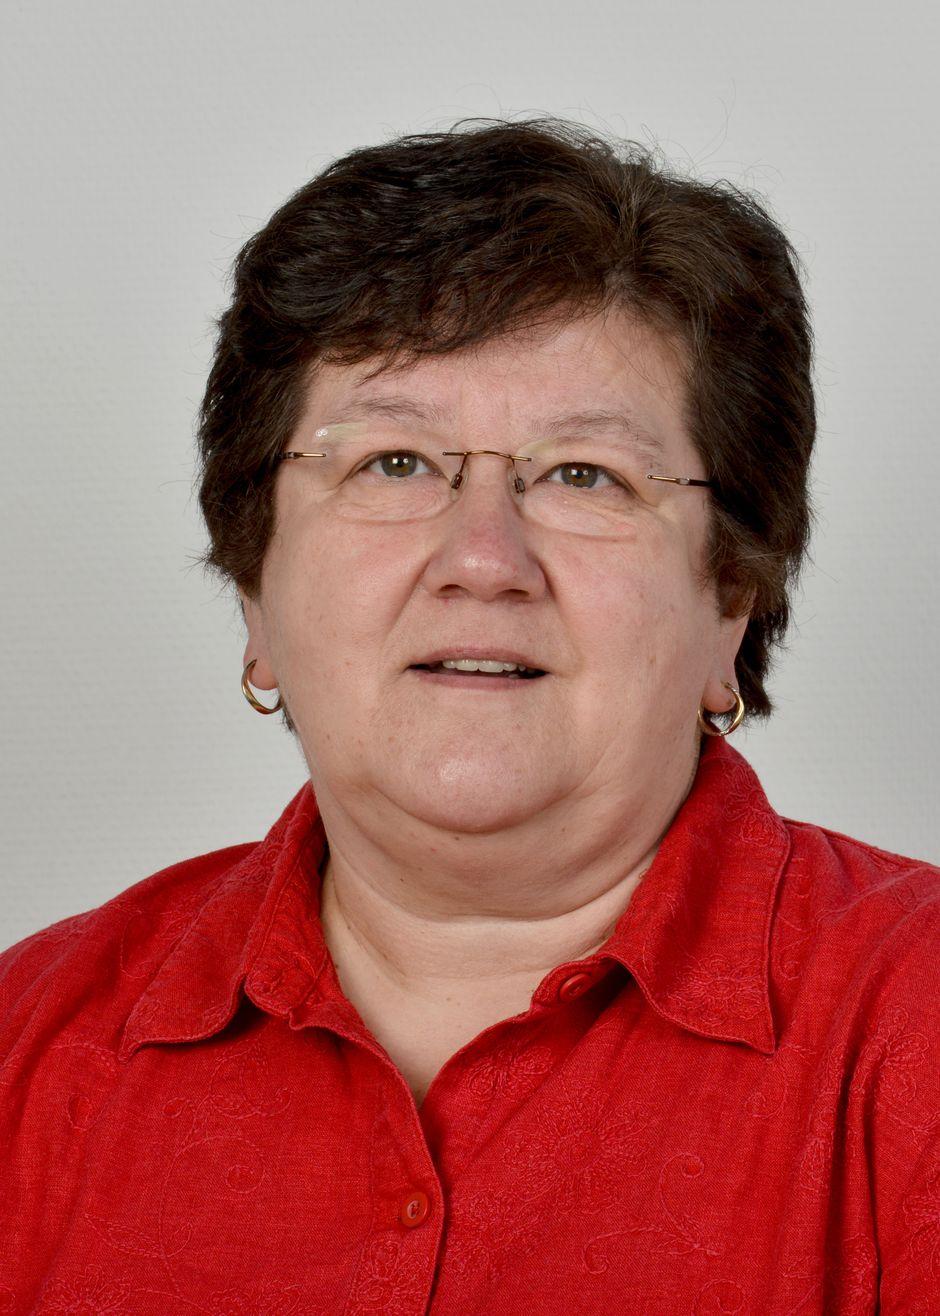 Manuela Roick